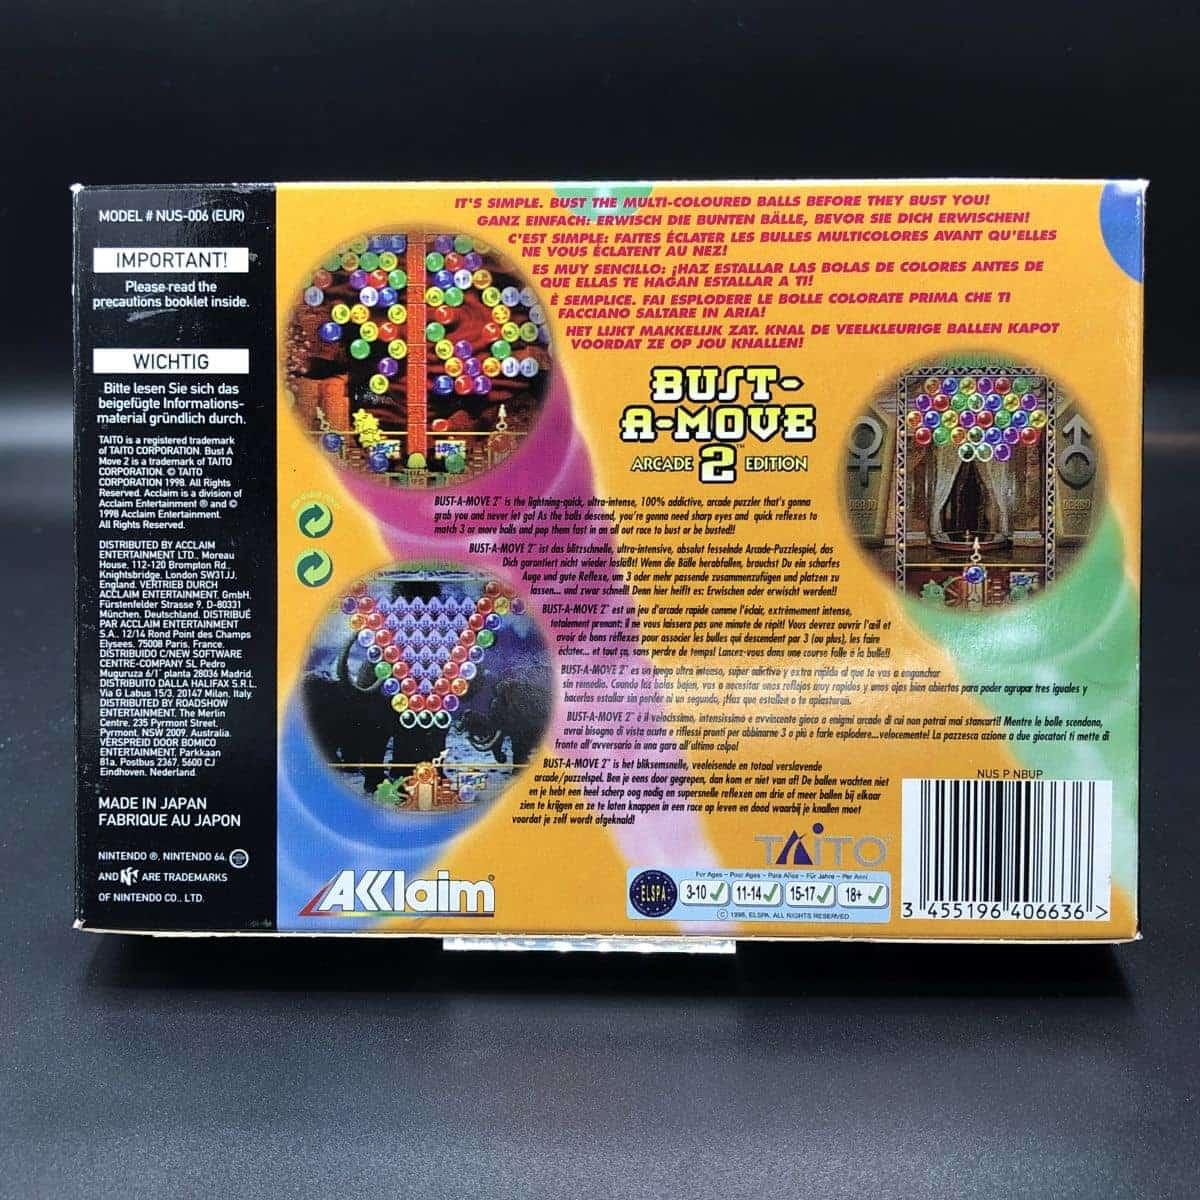 N64 Bust-A-Move 2: Arcade Edition (Komplett) (Sehr gut) Nintendo 64